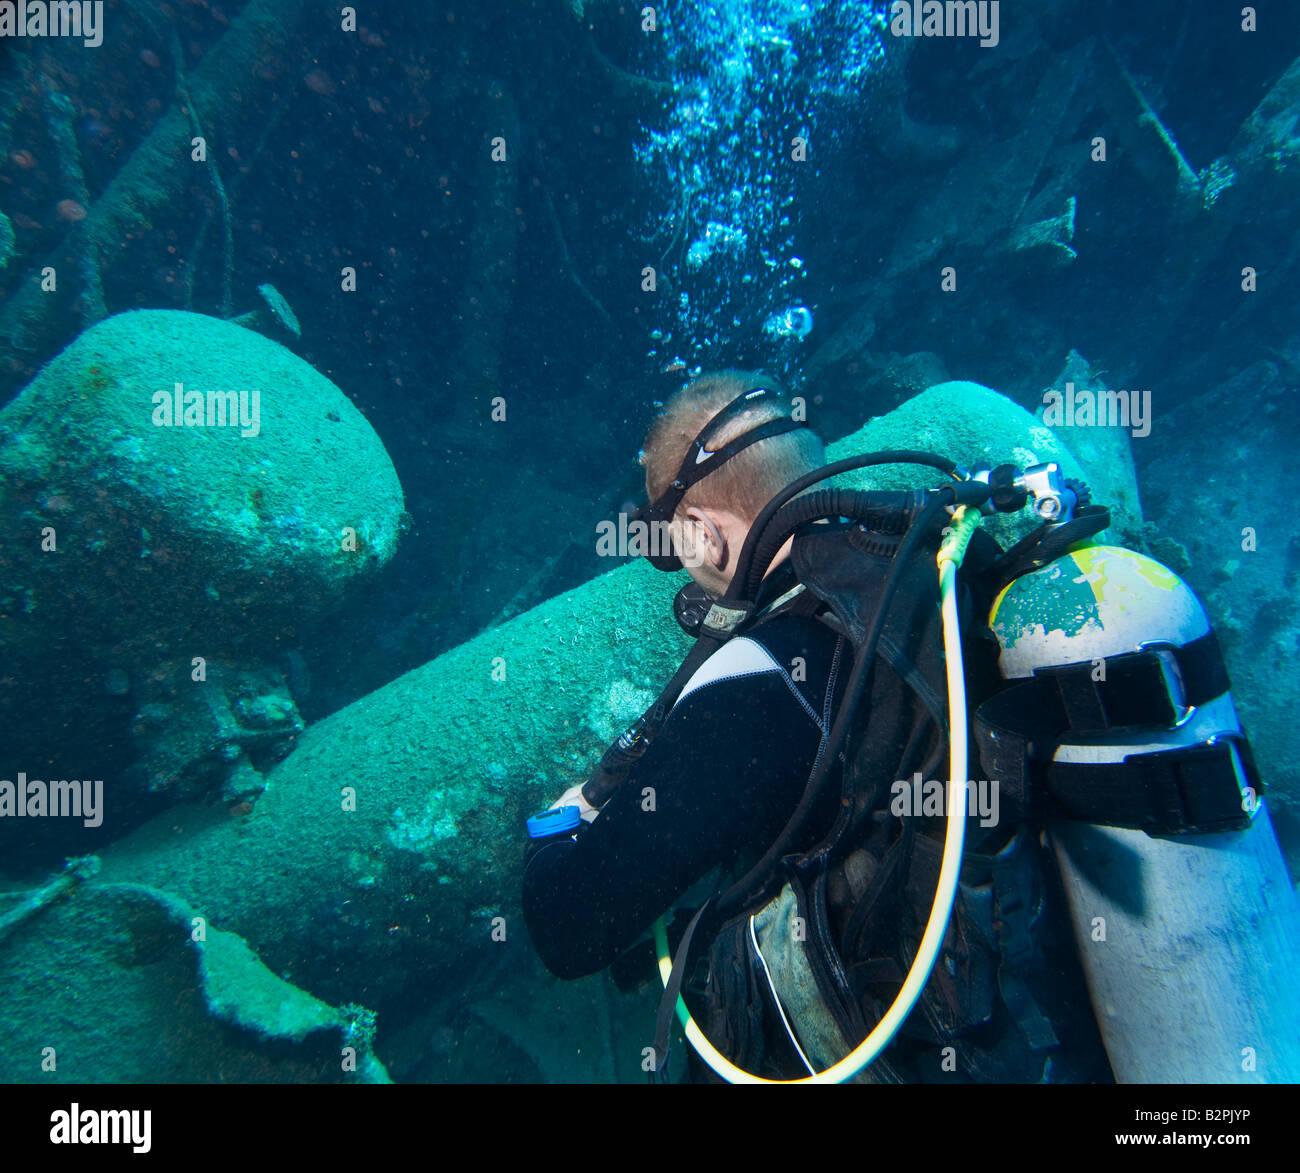 ABU GHUSUN diving in wreck wrack crock wreckage DIVER WRECKDIVER WRECKDIVE man he 1 single looks looking into hull - Stock Image